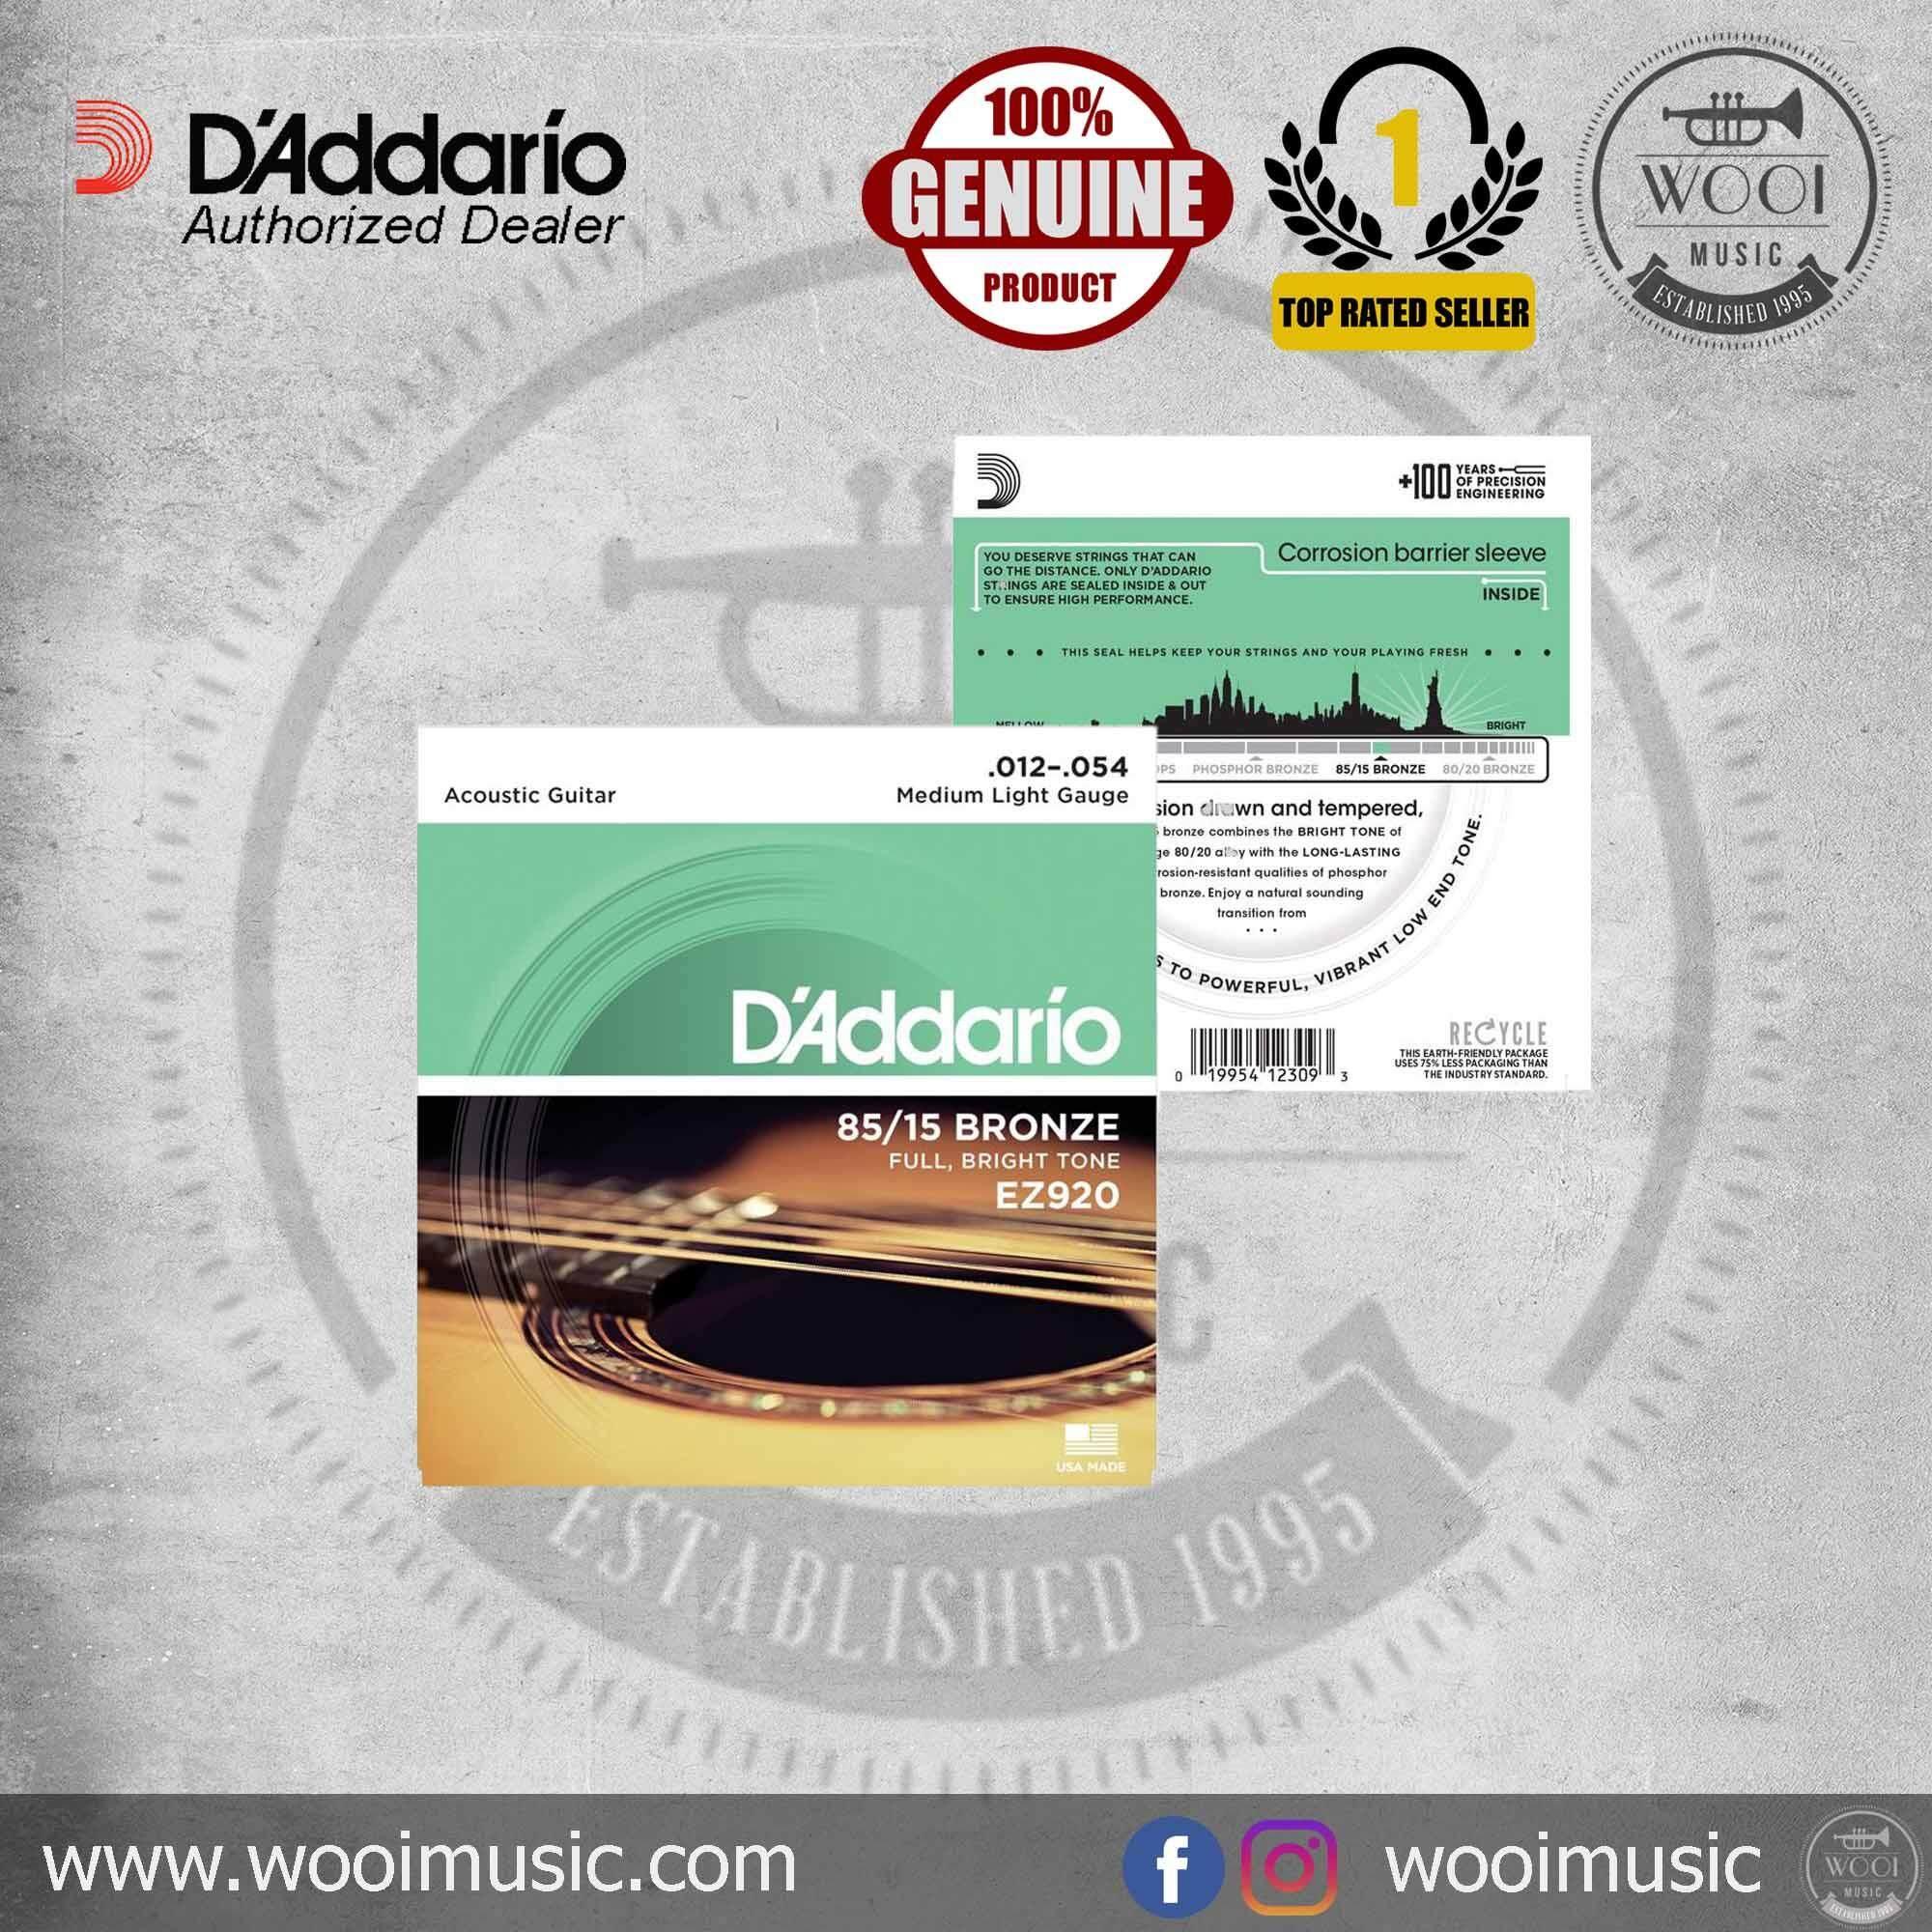 DAddario EZ920 85/15 American Bronze Medium Light Acoustic Guitar Strings (012-054)